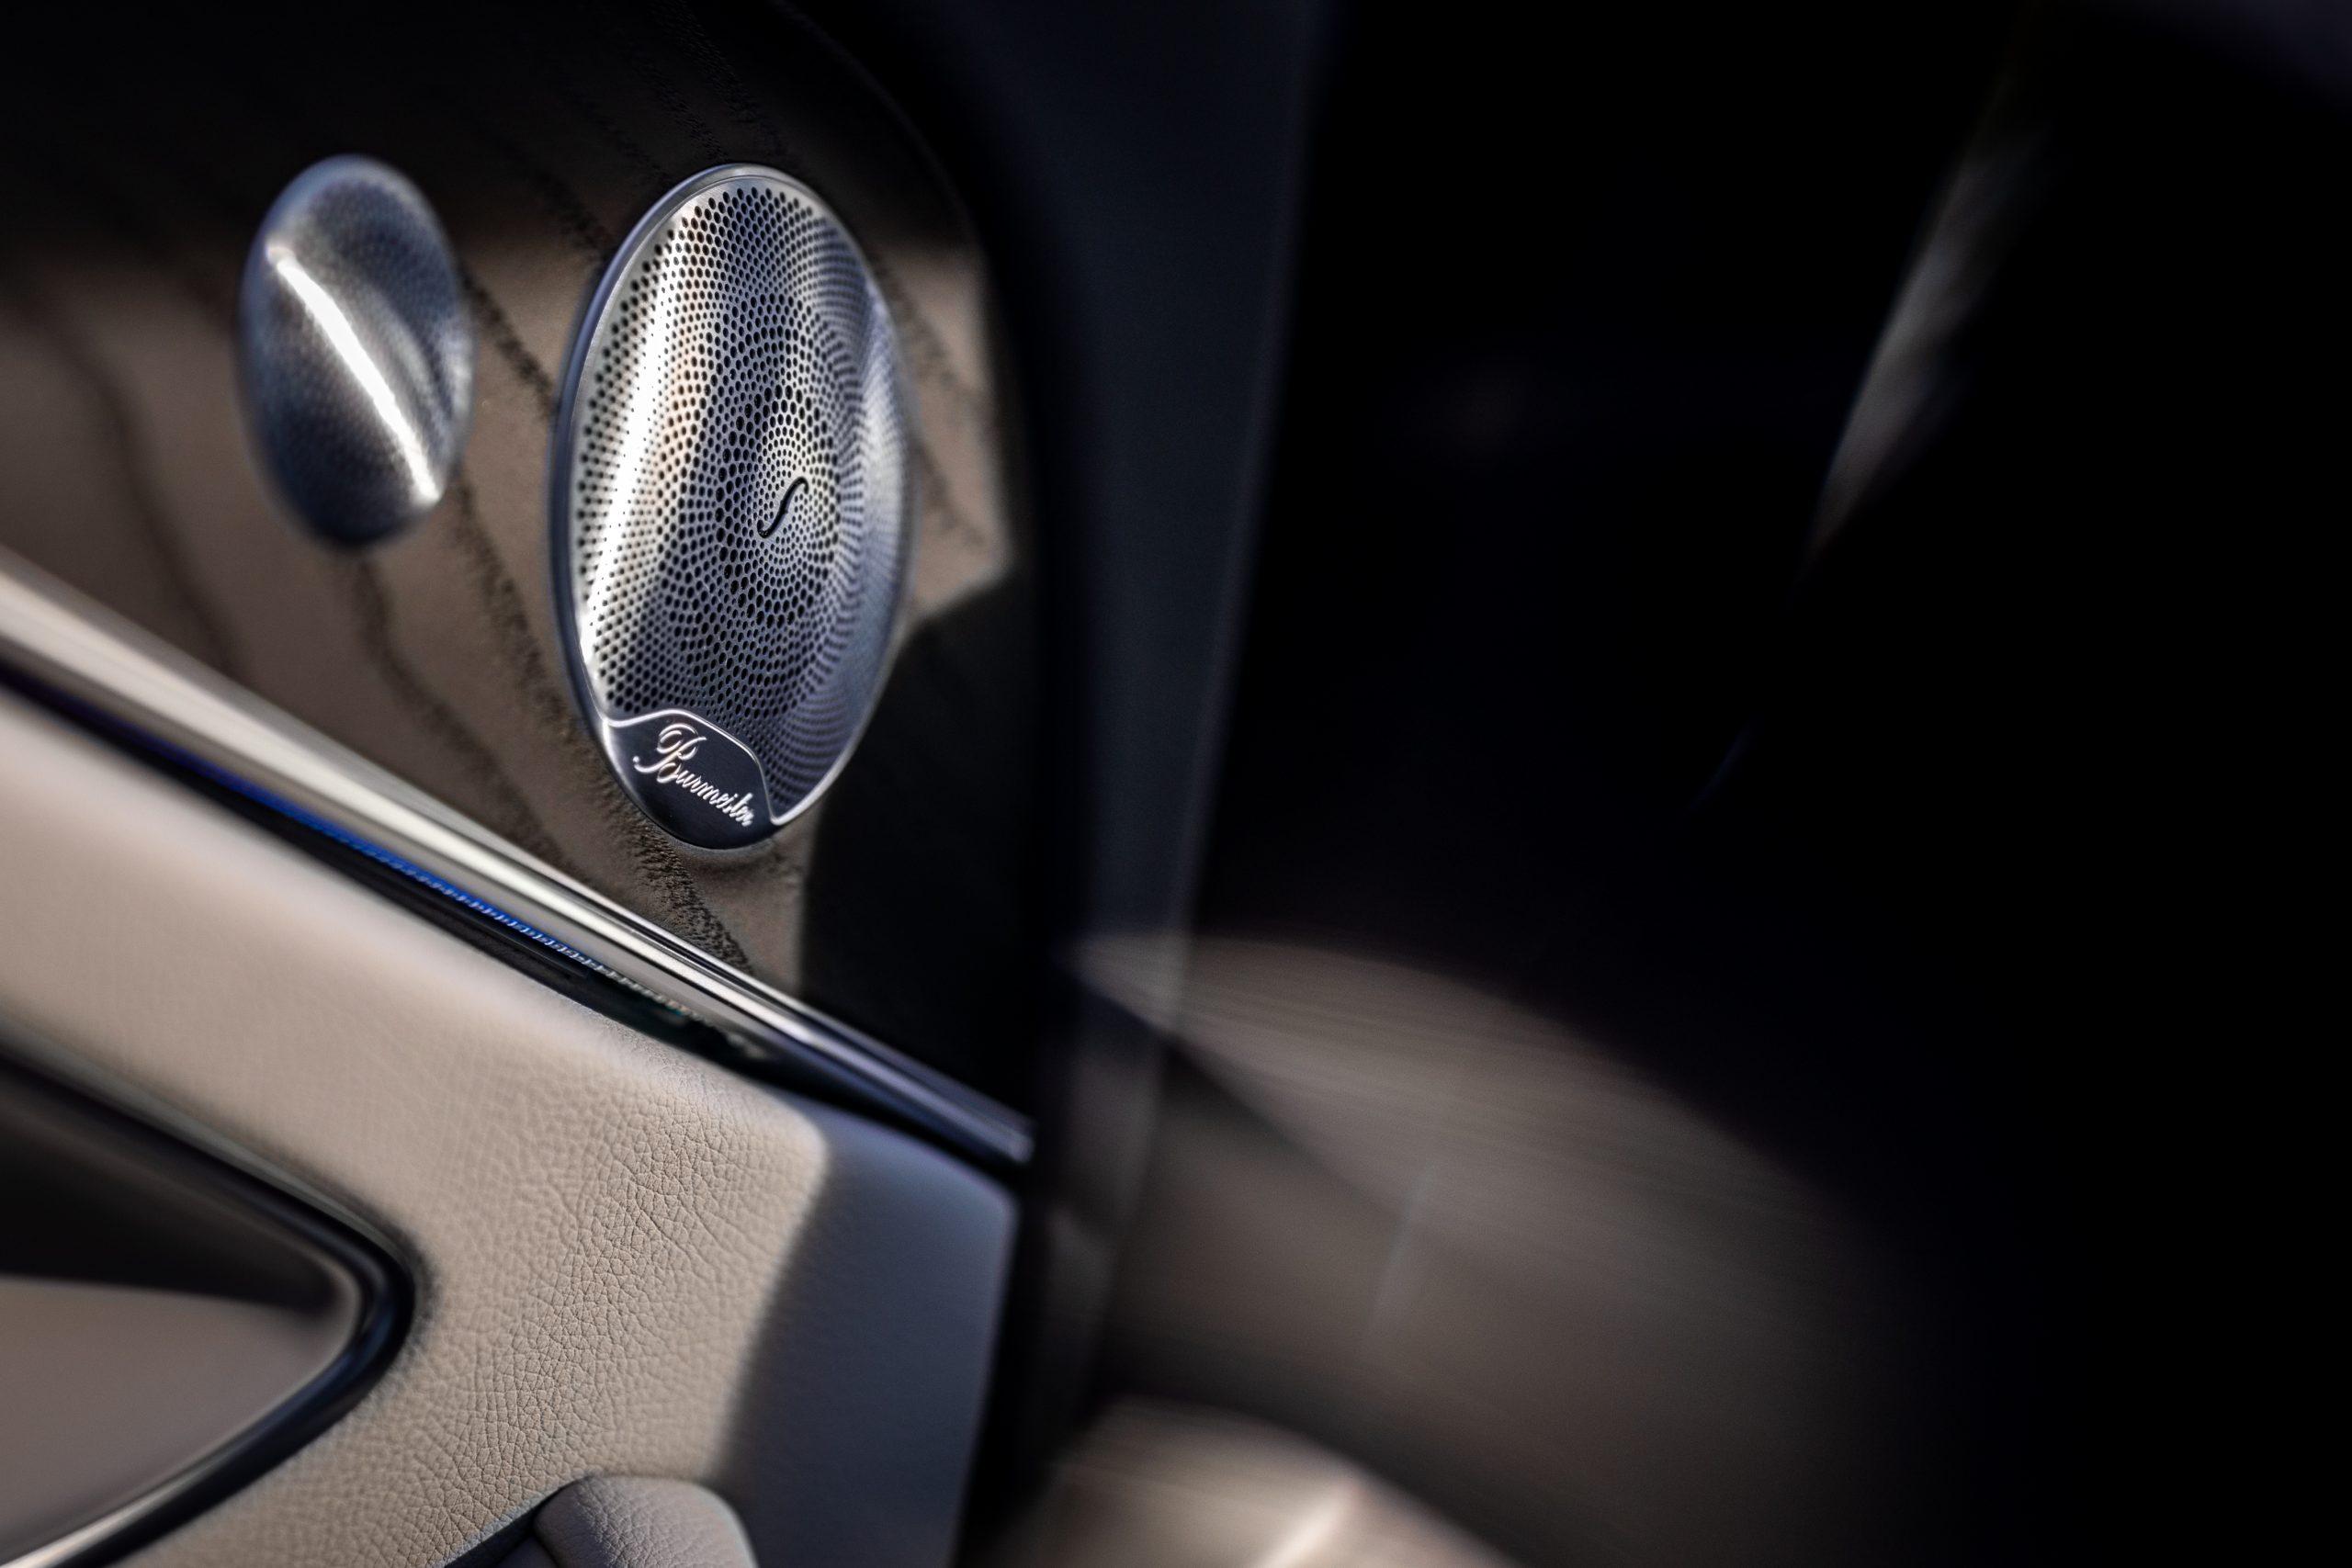 2021 Mercedes Benz E 450 4MATIC speaker detail